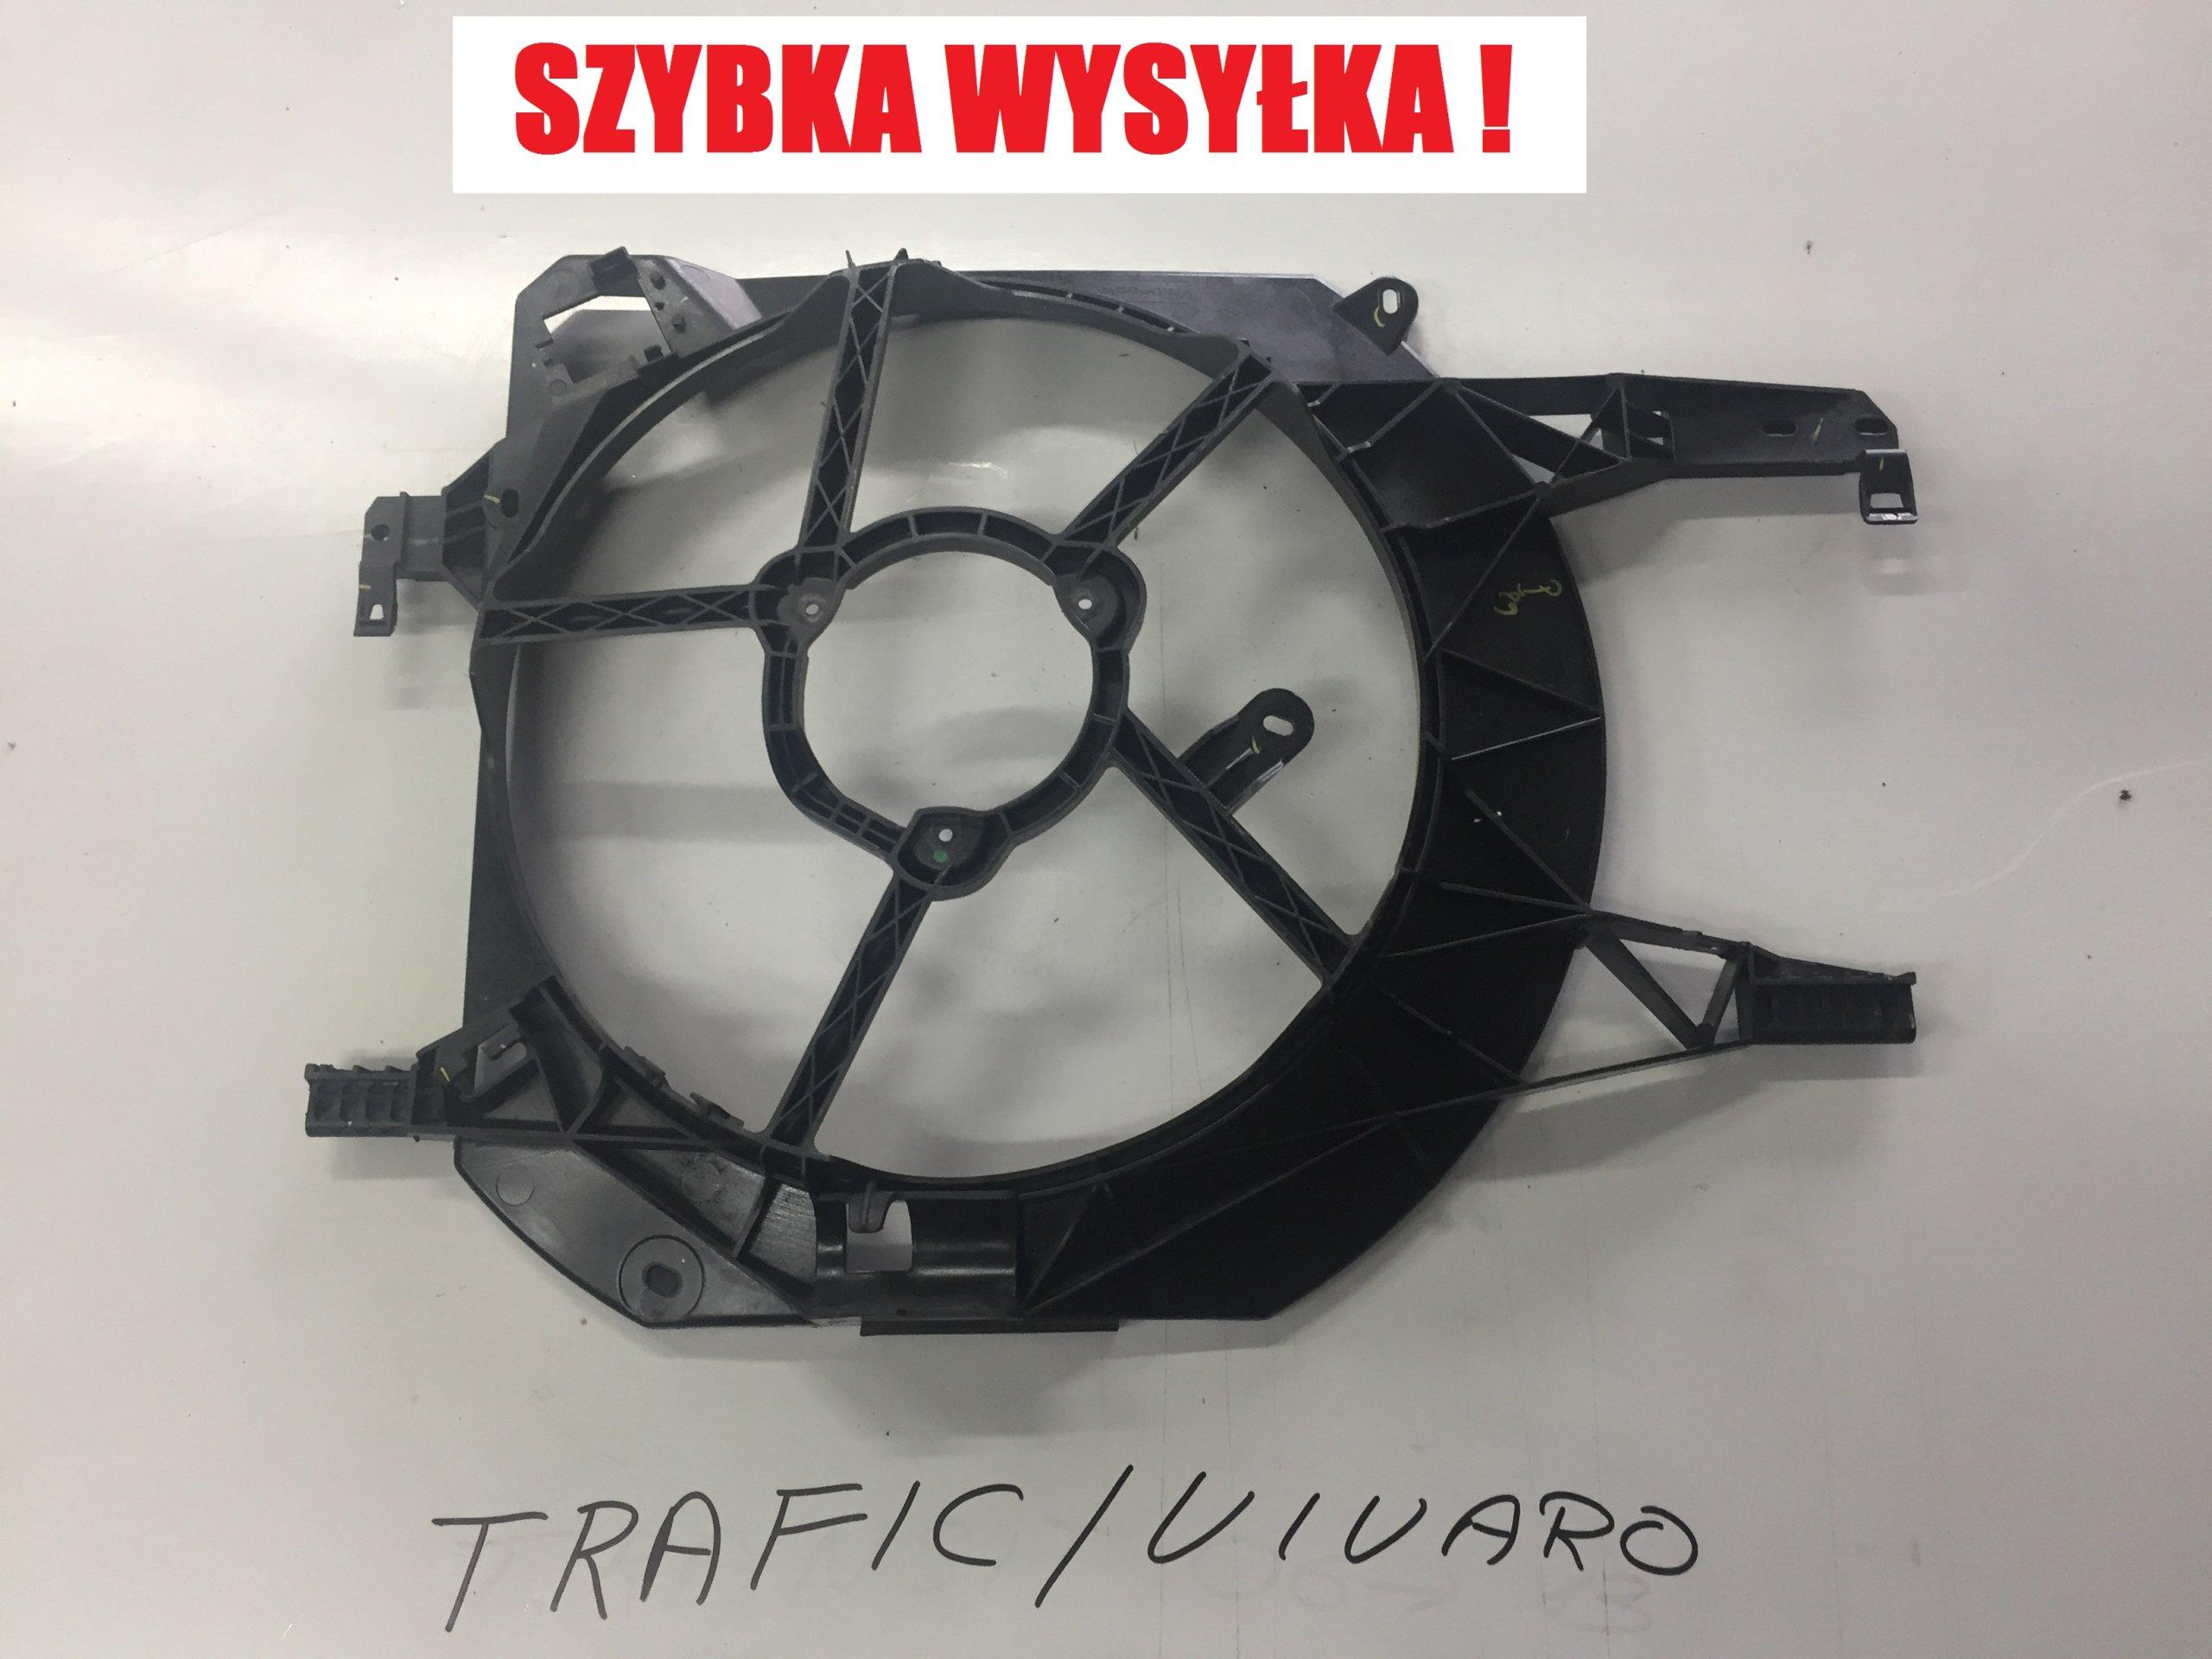 КОРПУС ВЕНТИЛЯТОРА 1.9 2.0 VIVARO TRAFIC изображение 2